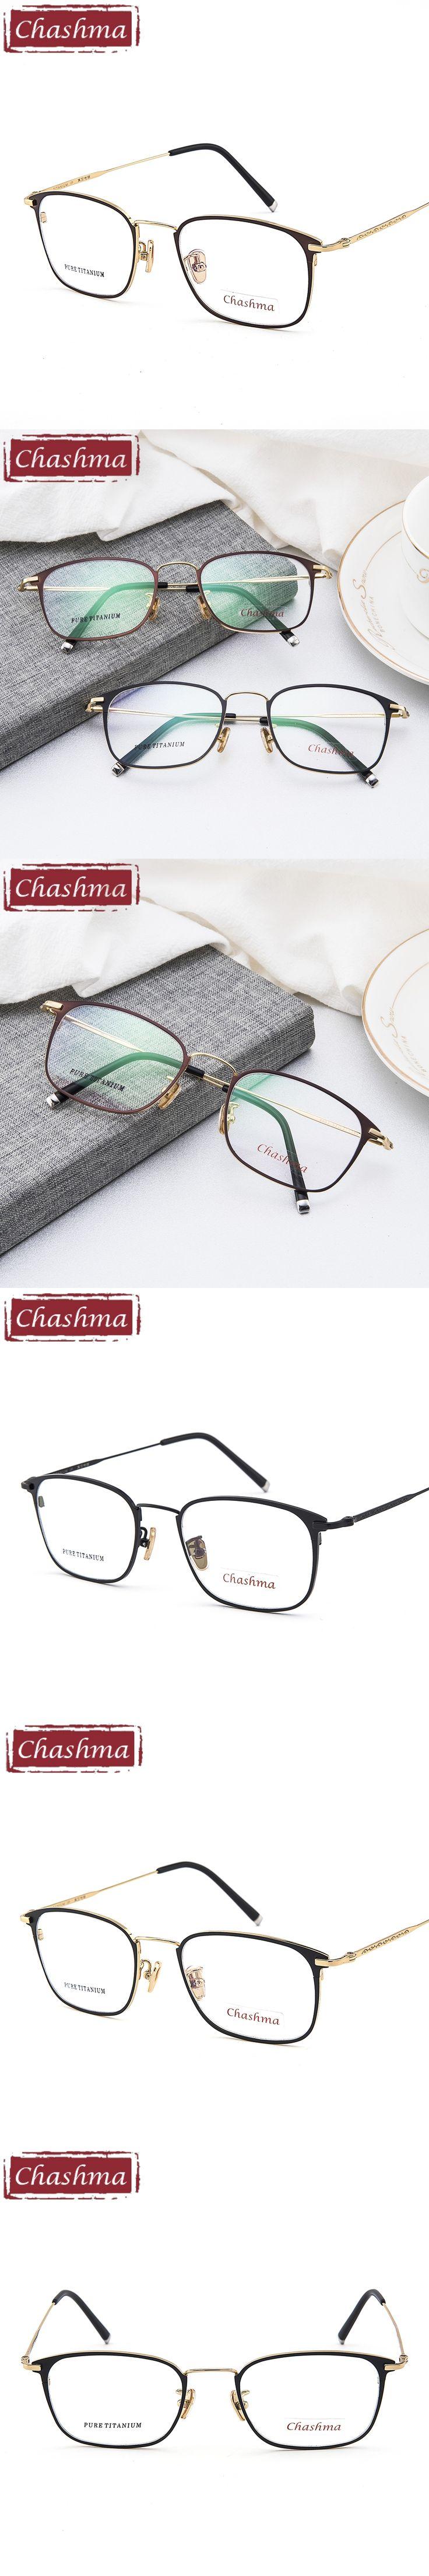 Chashma Brand Top Quality Glasses Frame Titanium Women Eyeglasses Male Prescription Spectacles Clear Color Lenses